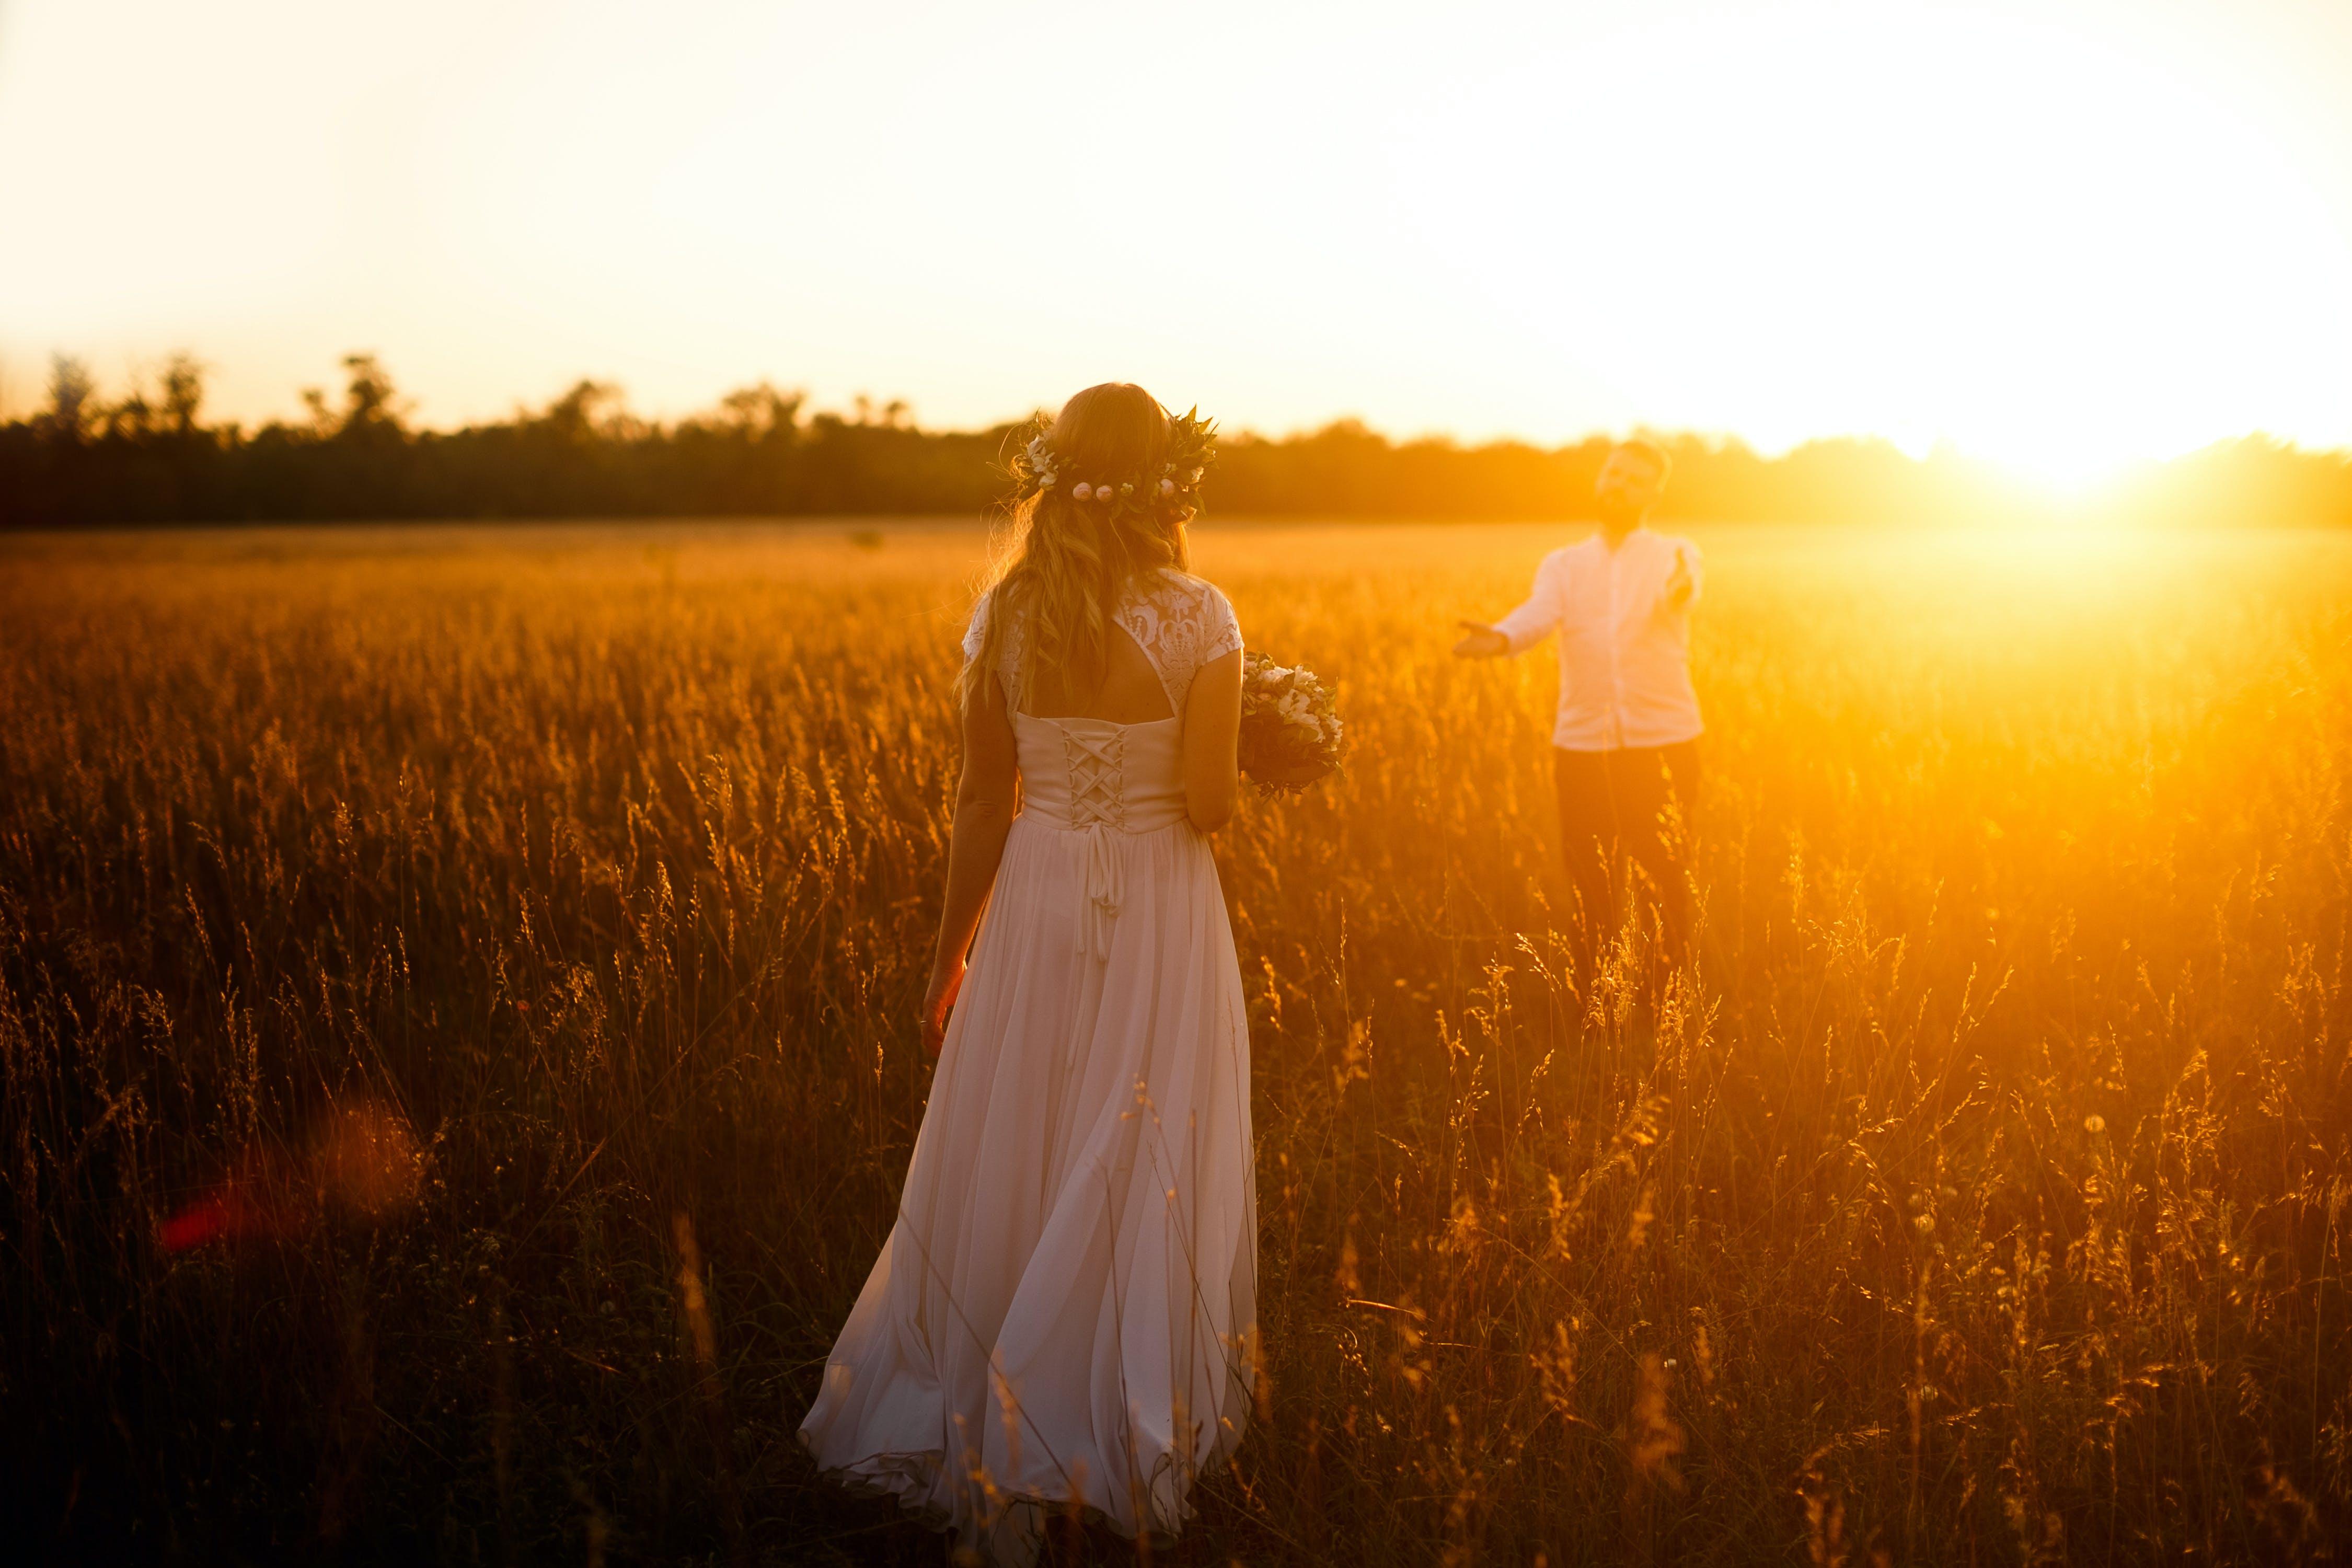 Woman In White Dress Holding Bouquet on Field